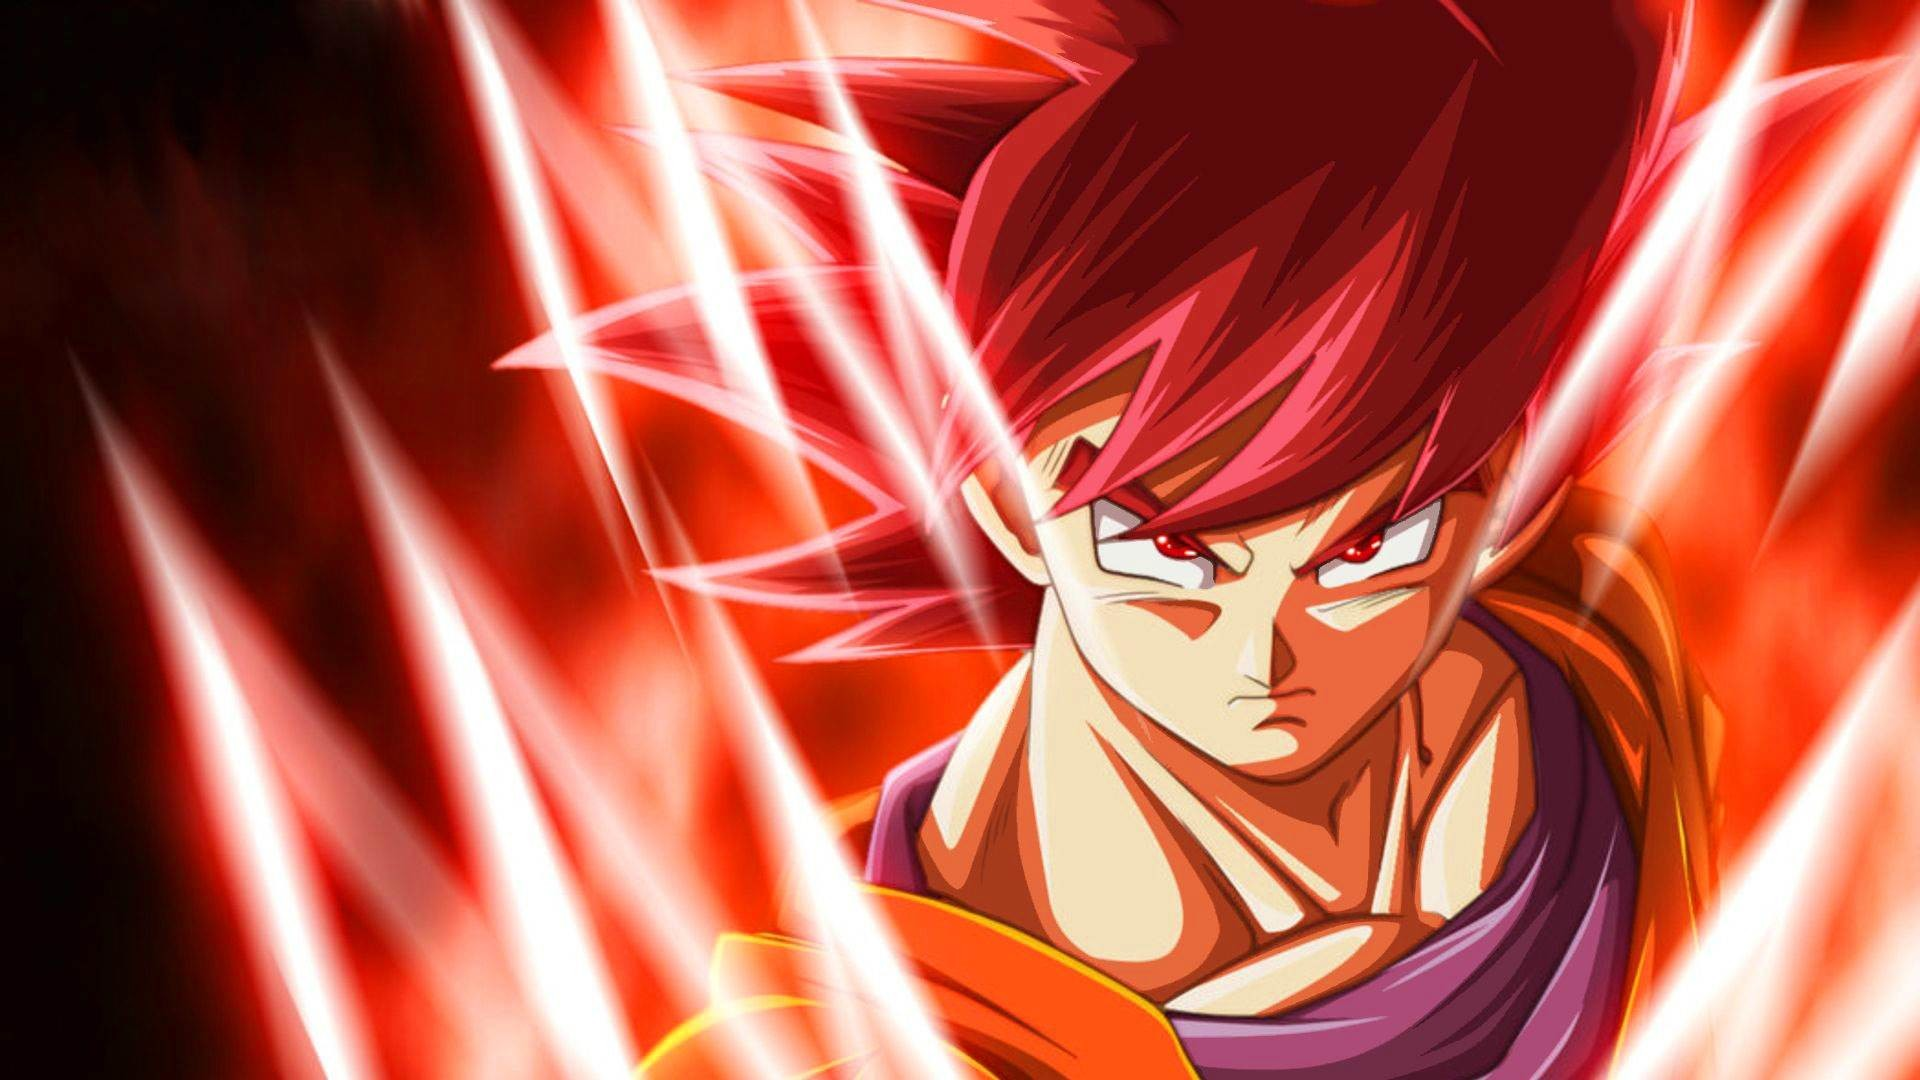 Goku Super Saiyan 4 Wallpaper 66 Images